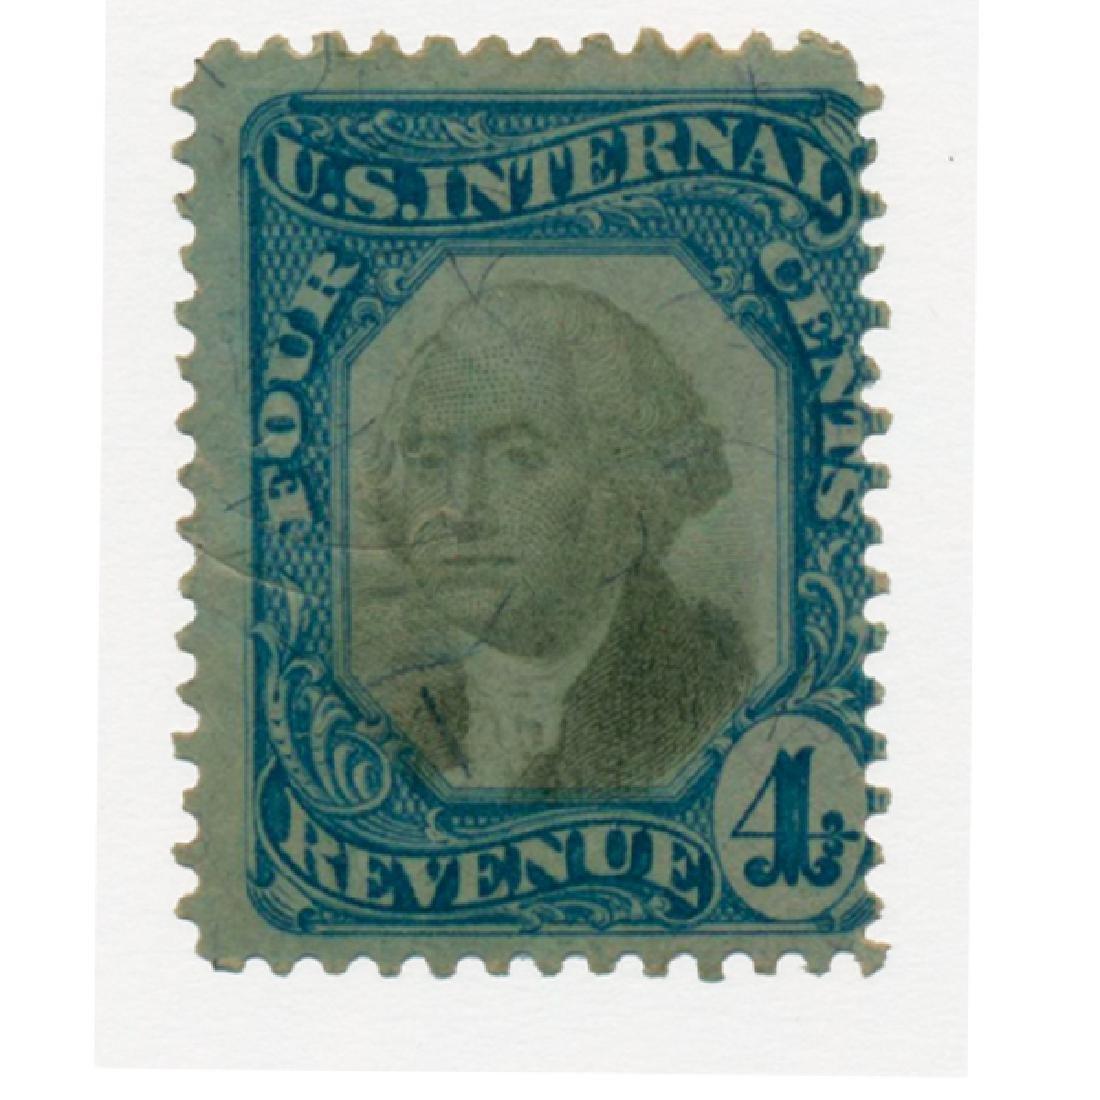 1871 US 4c Revenue Stamp Scarce Cancel